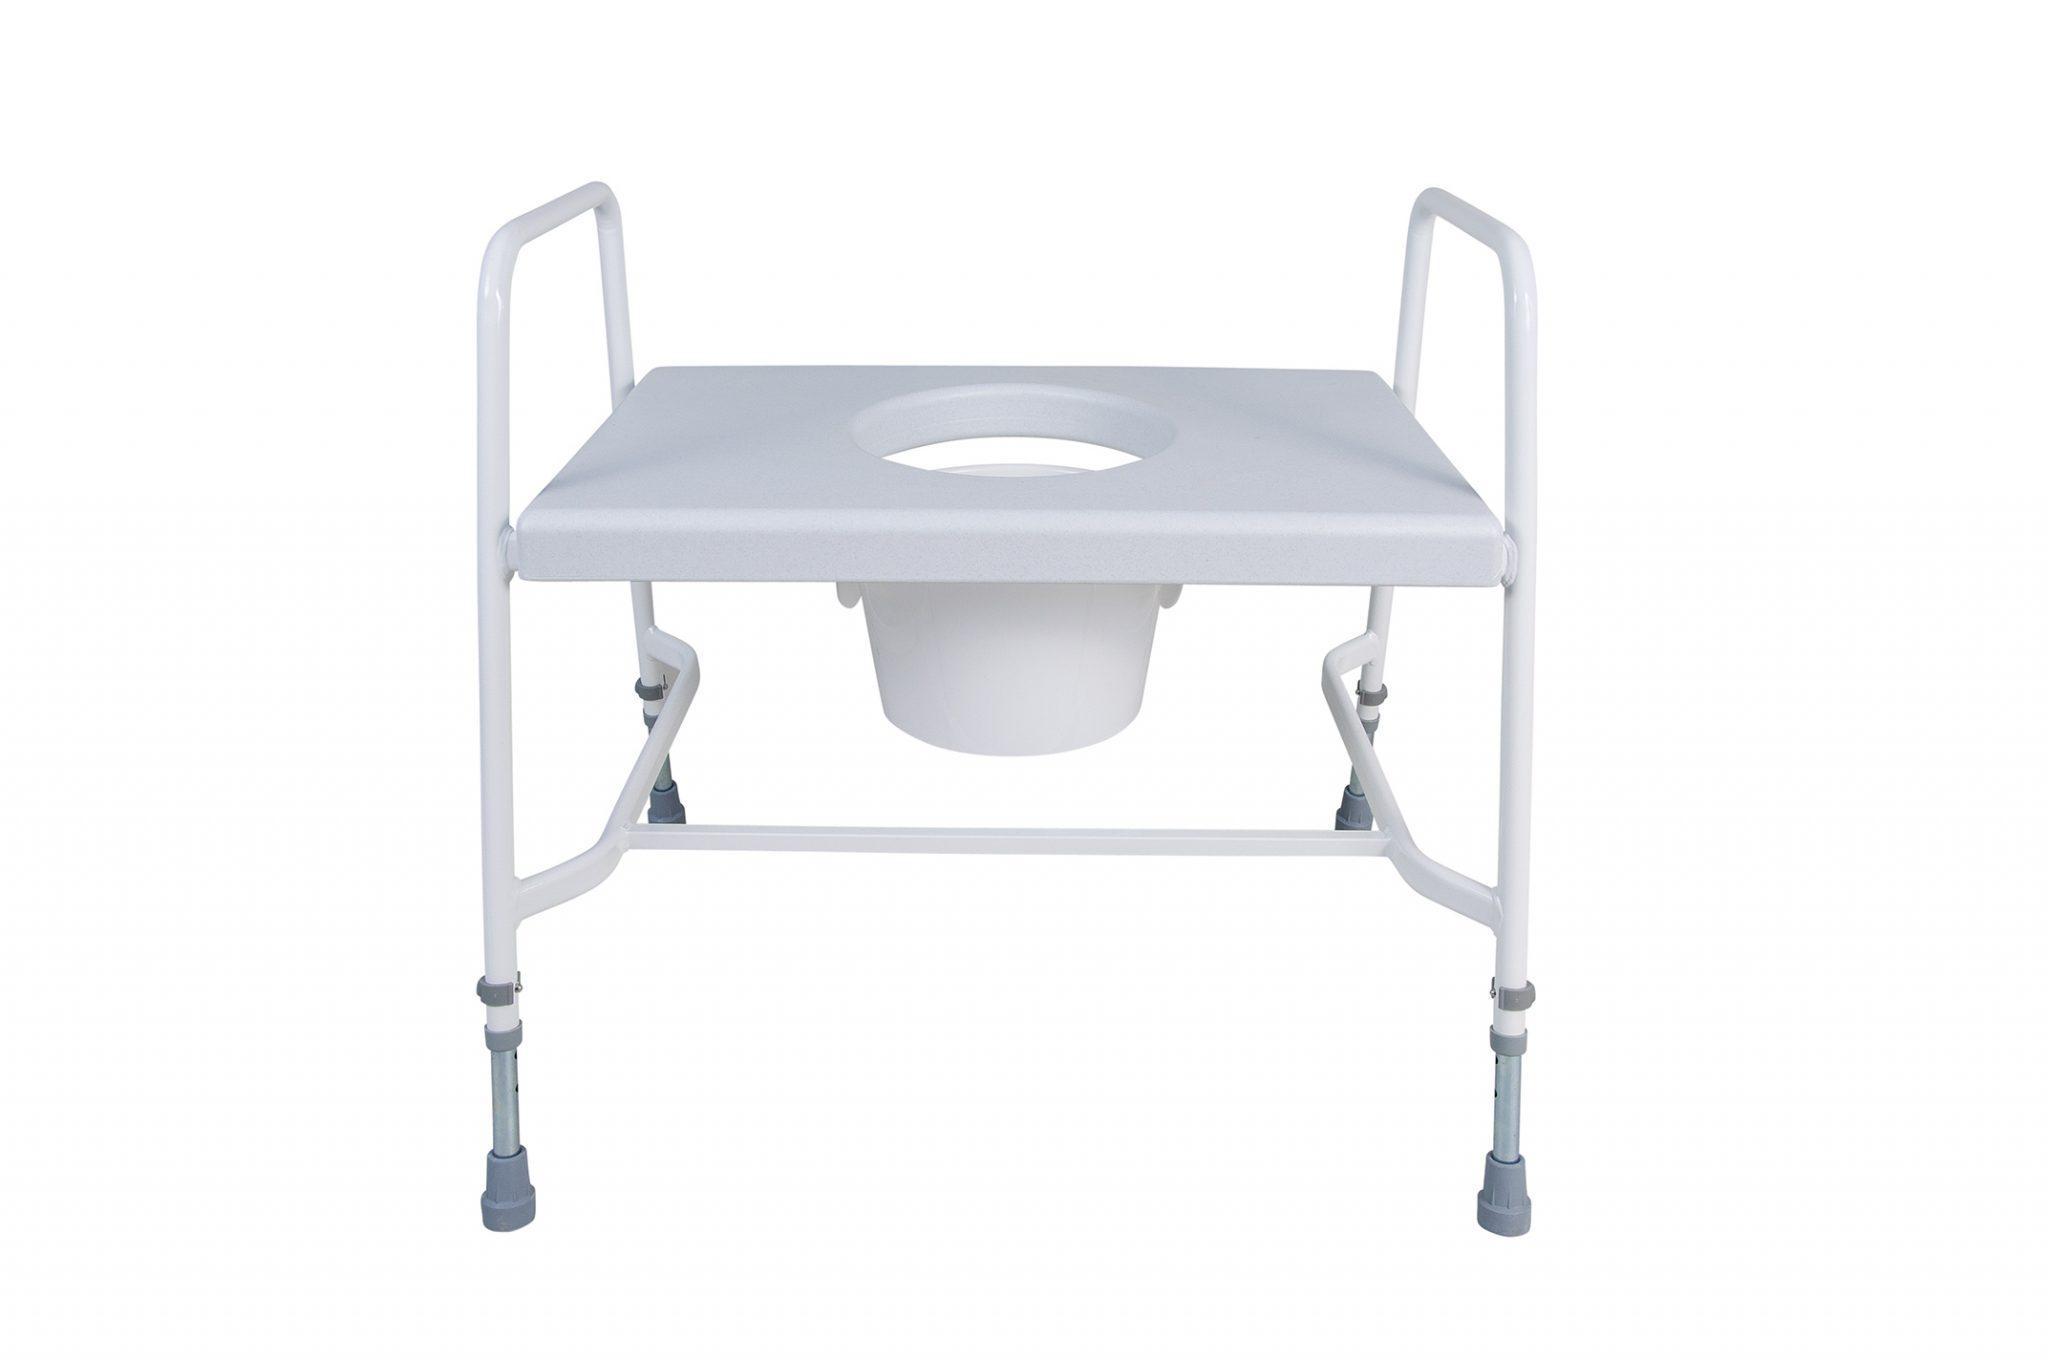 X152 Bariatric Raised Toilet Seat Cefndy Healthcare